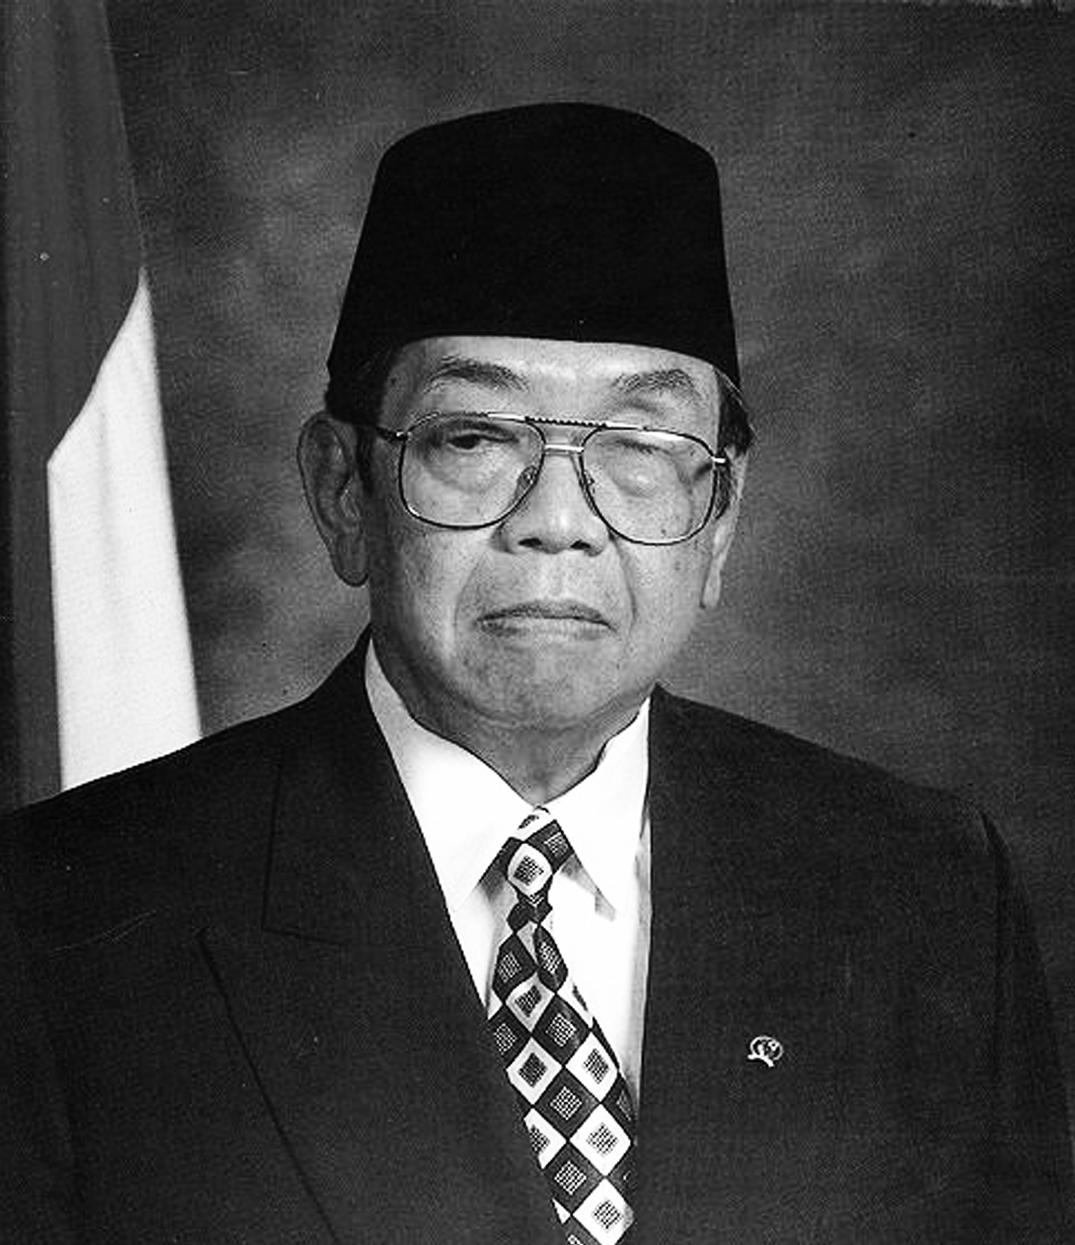 Presiden Abdurrahman Wahid (Gusdur) hitam putih